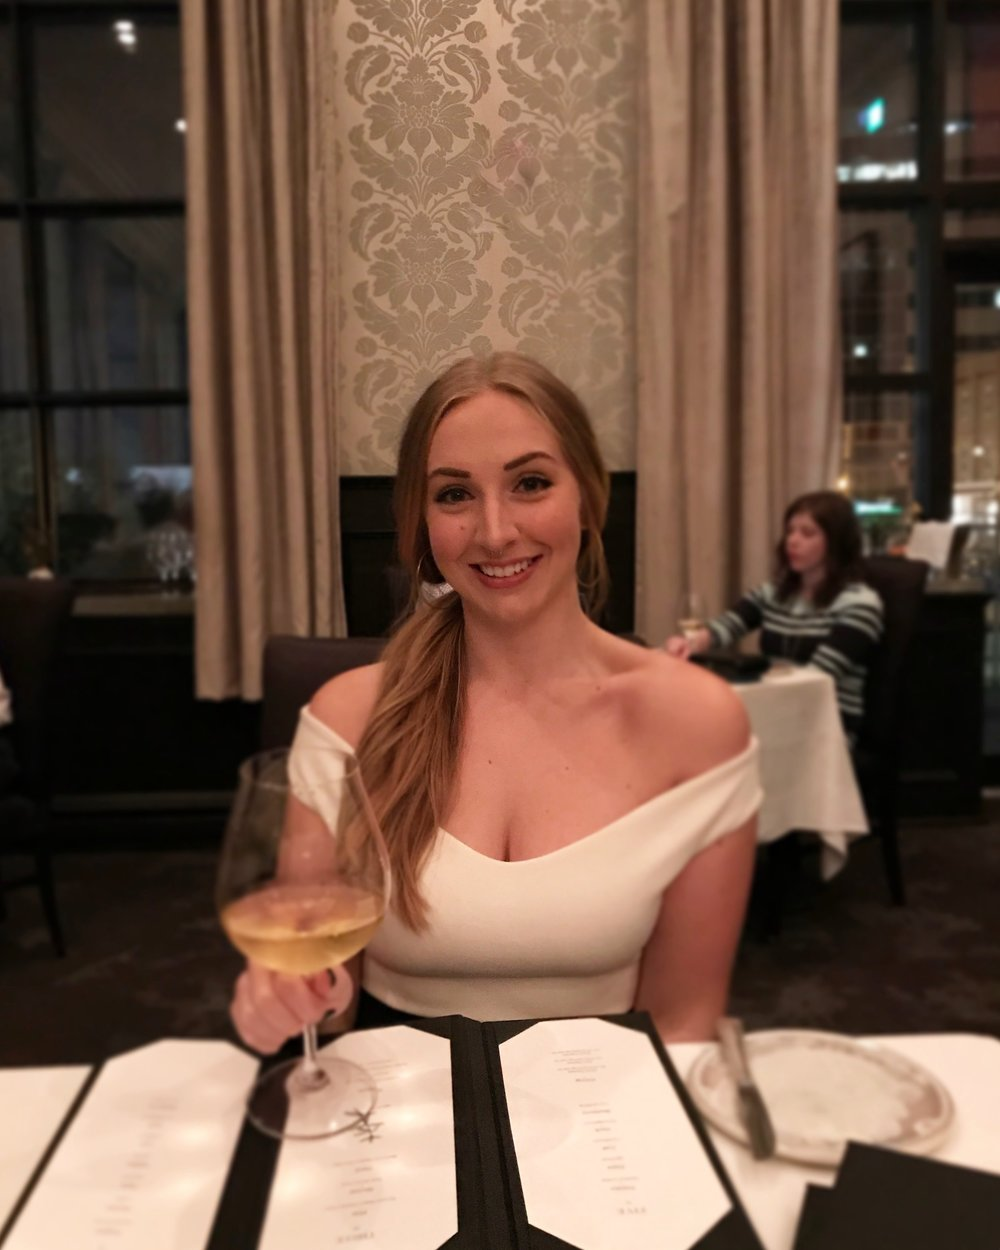 jessica kilfoy food blogger st. john's newfoundland raymonds restaurant wine